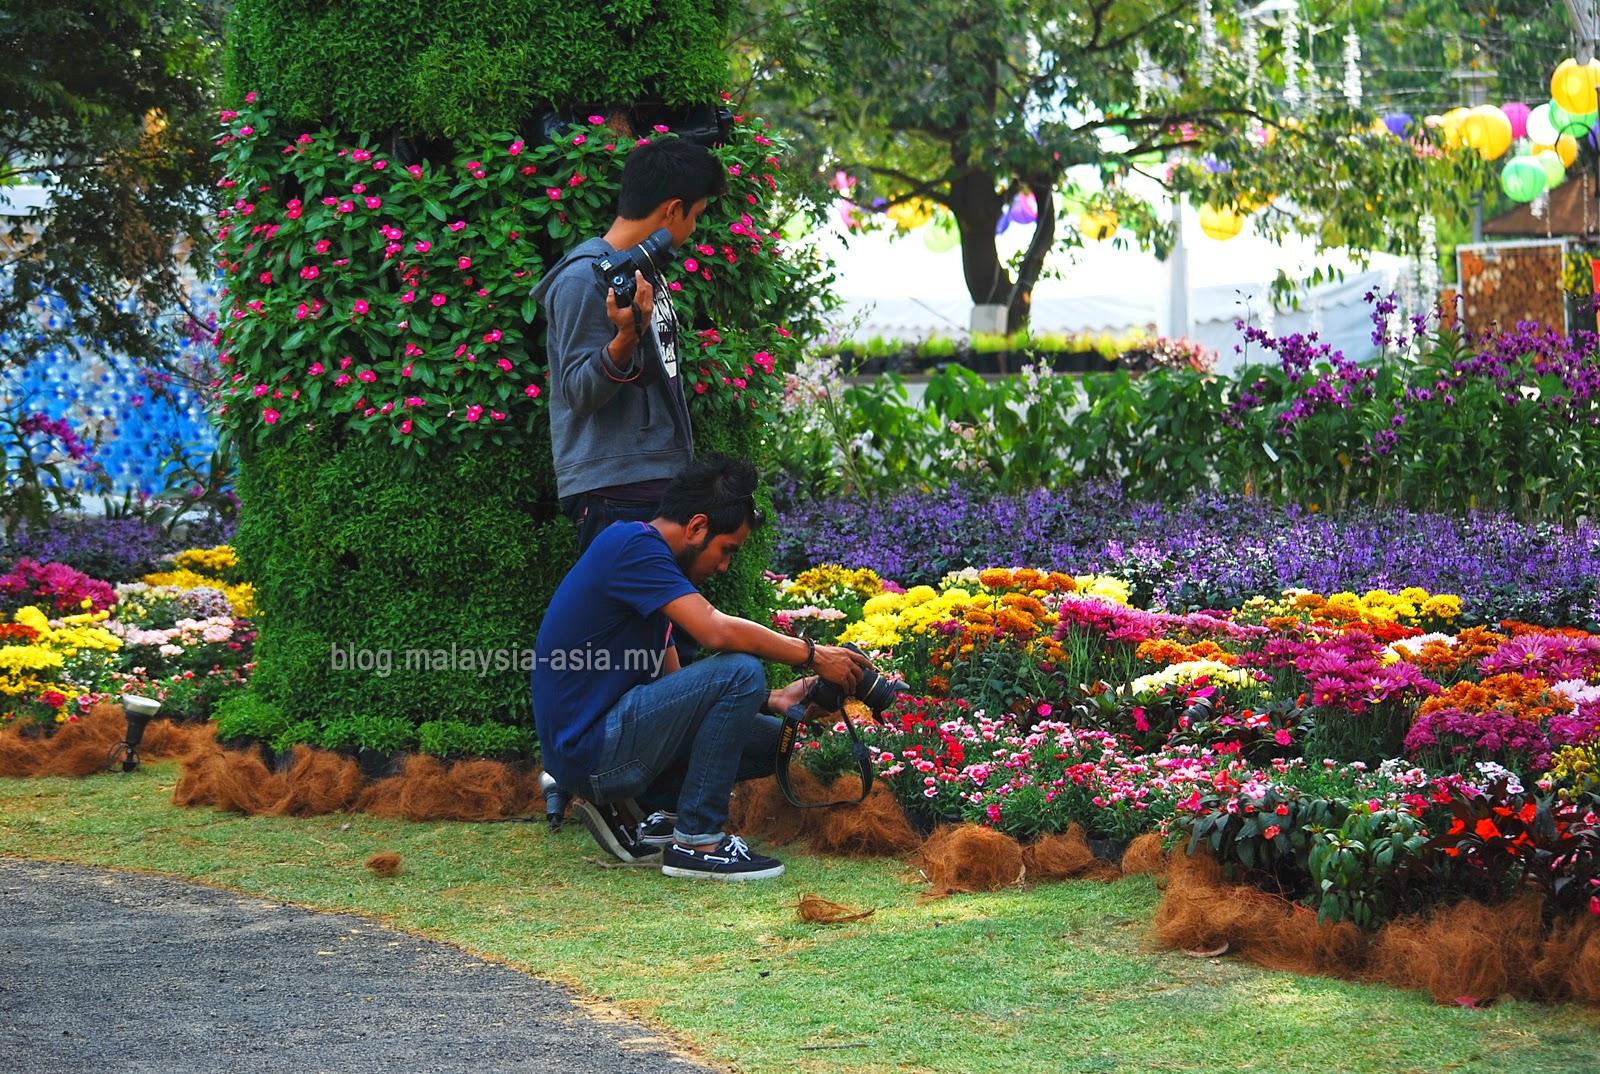 Flower Garden Festival in Malaysia